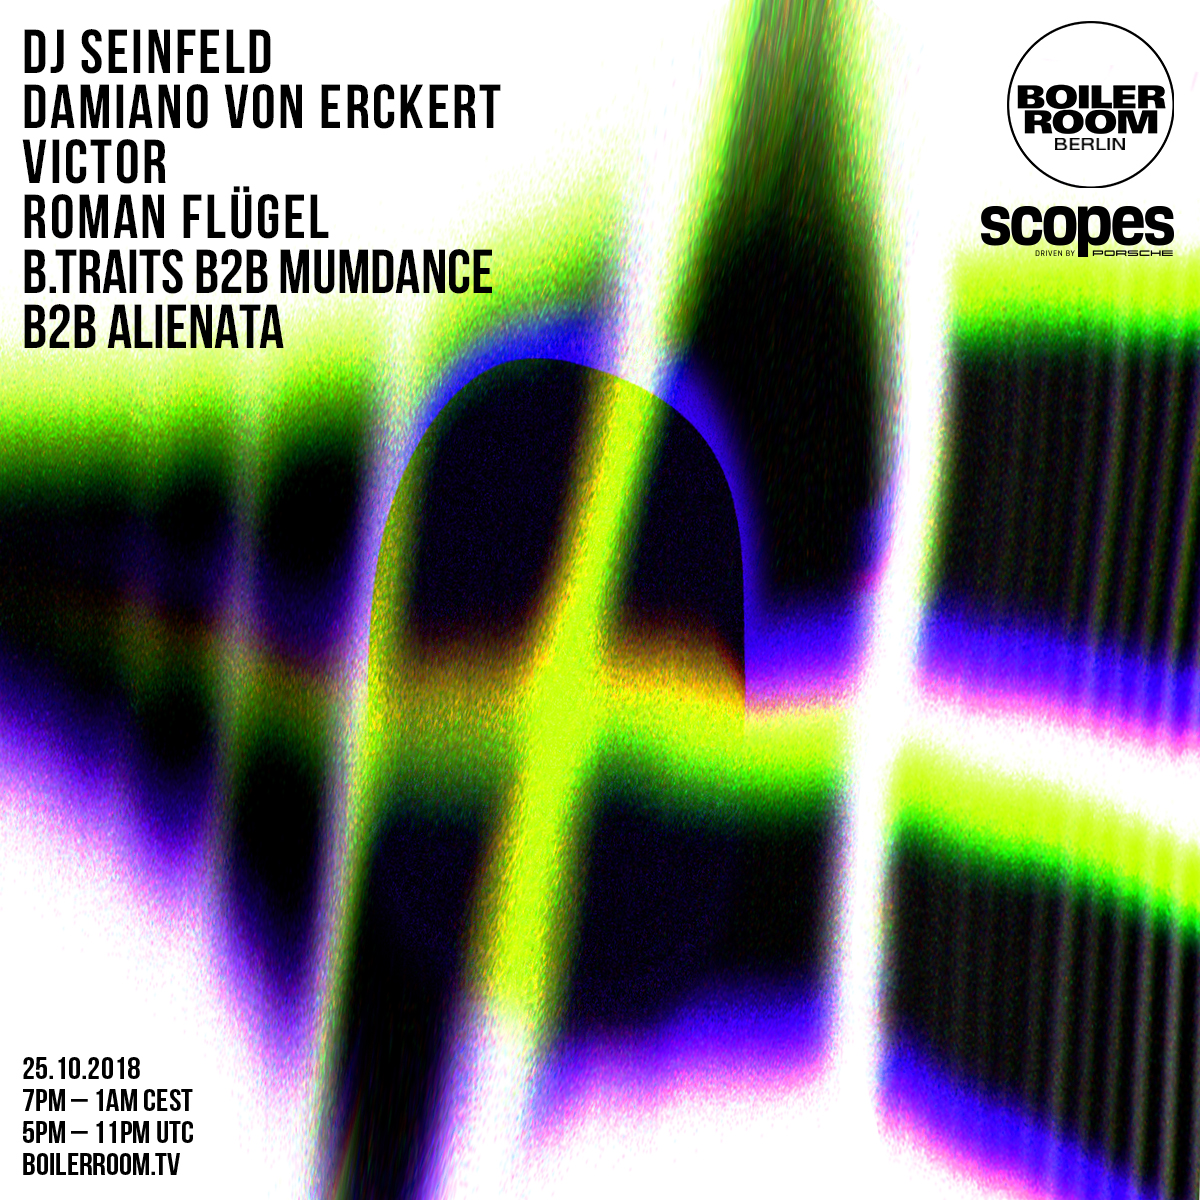 Scopes x Boiler Room Berlin Flyer Image